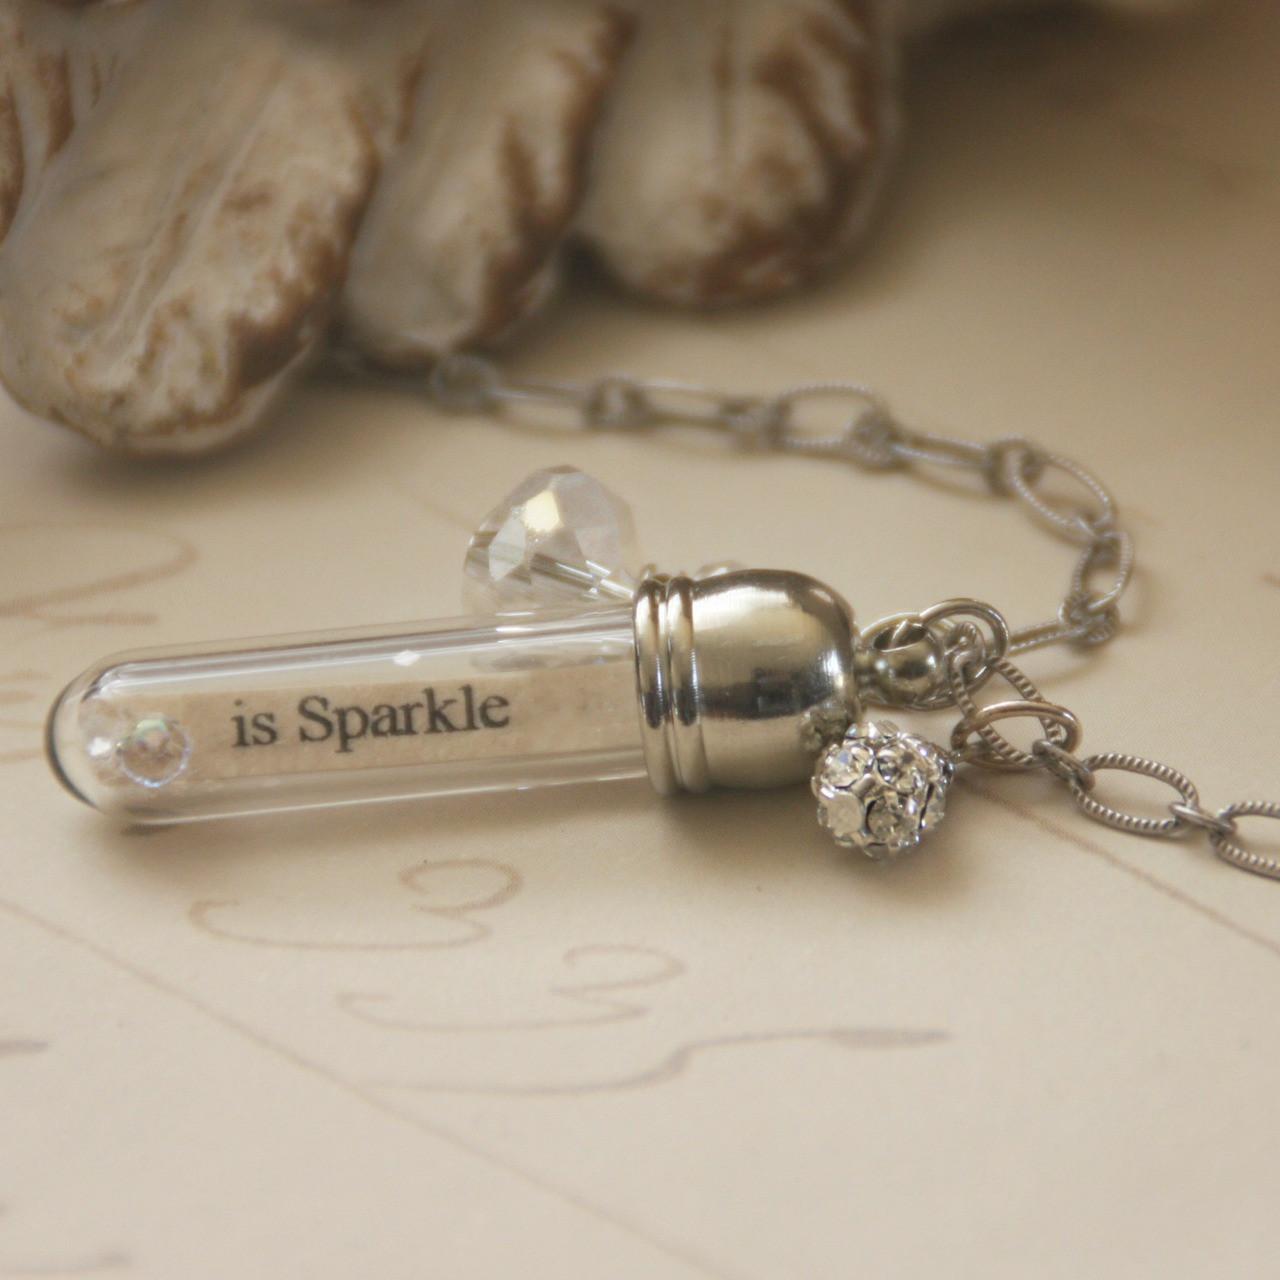 MM-K  My favorite color is Sparkle